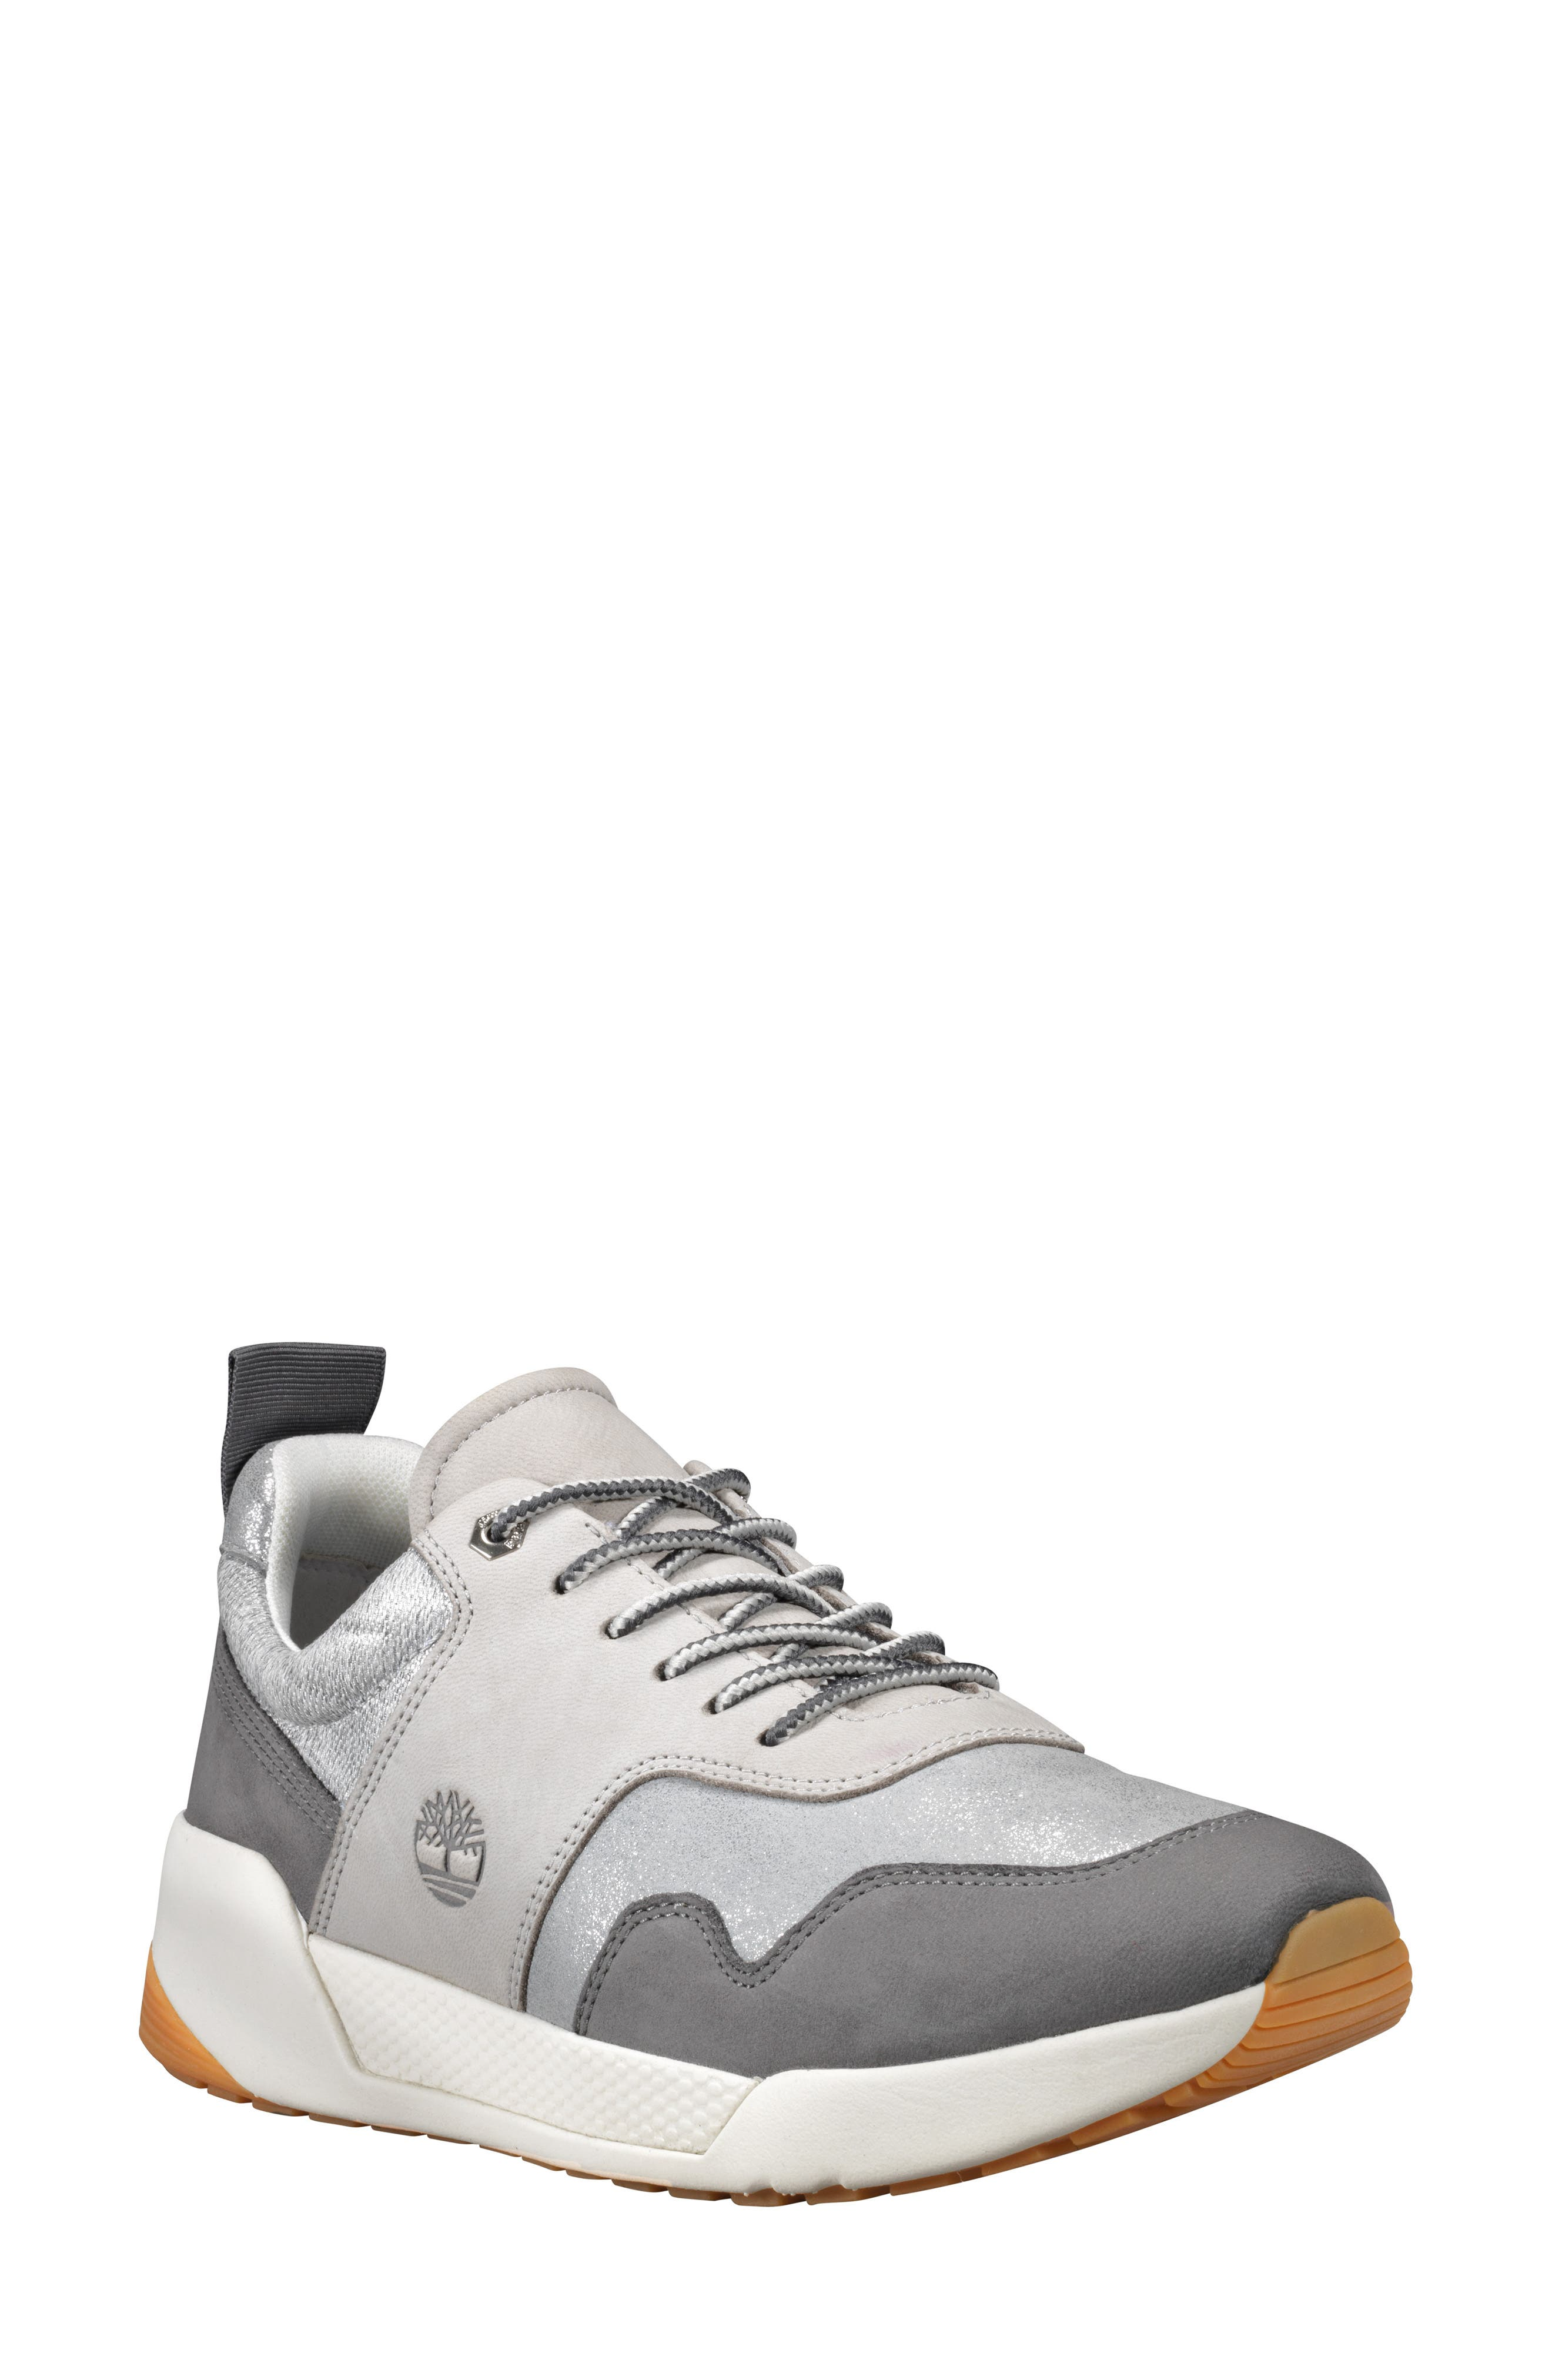 Timberland Kiri-Up Oxford Sneaker- Grey